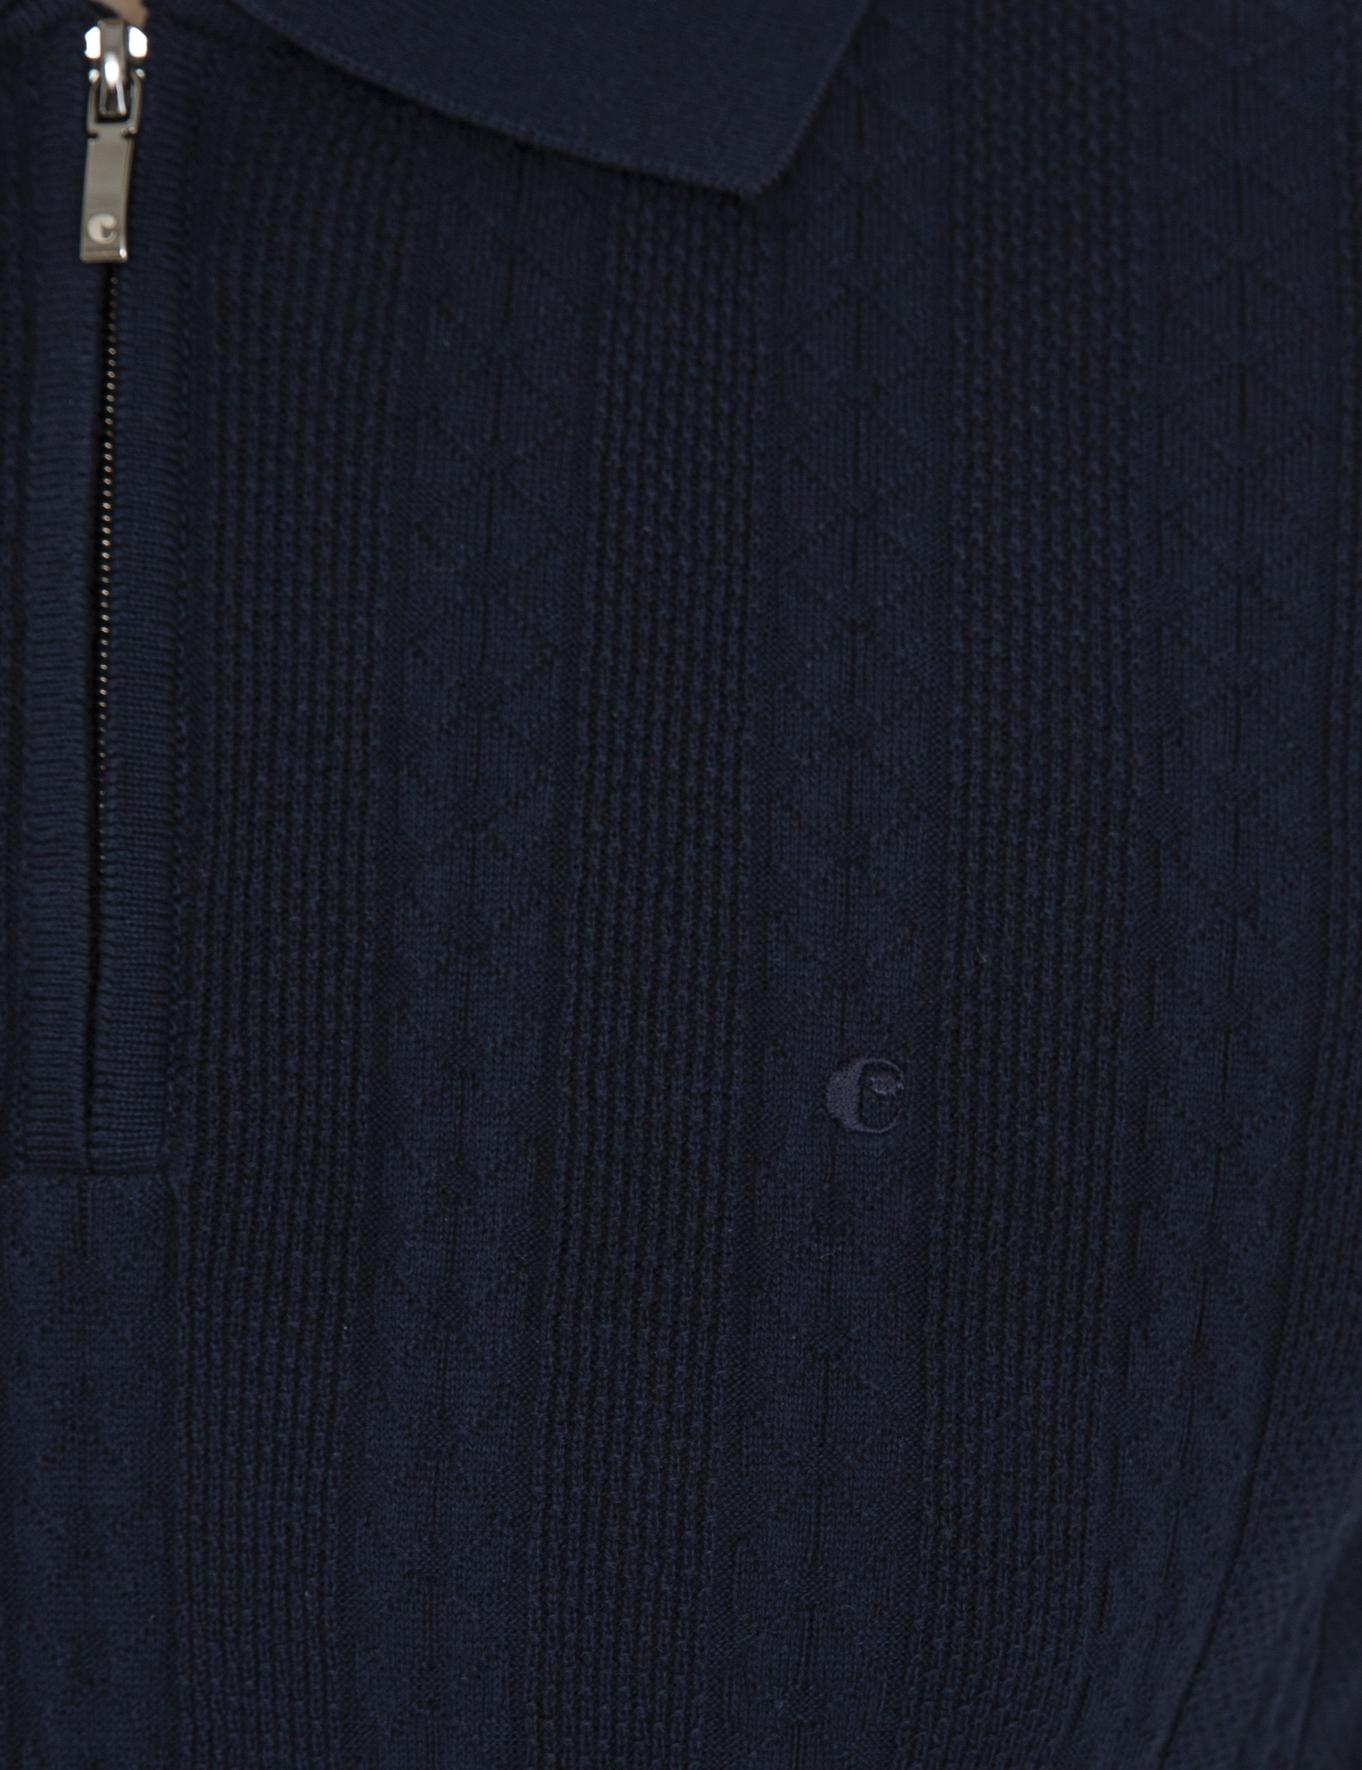 Polo Yaka Kazak - 50235792006